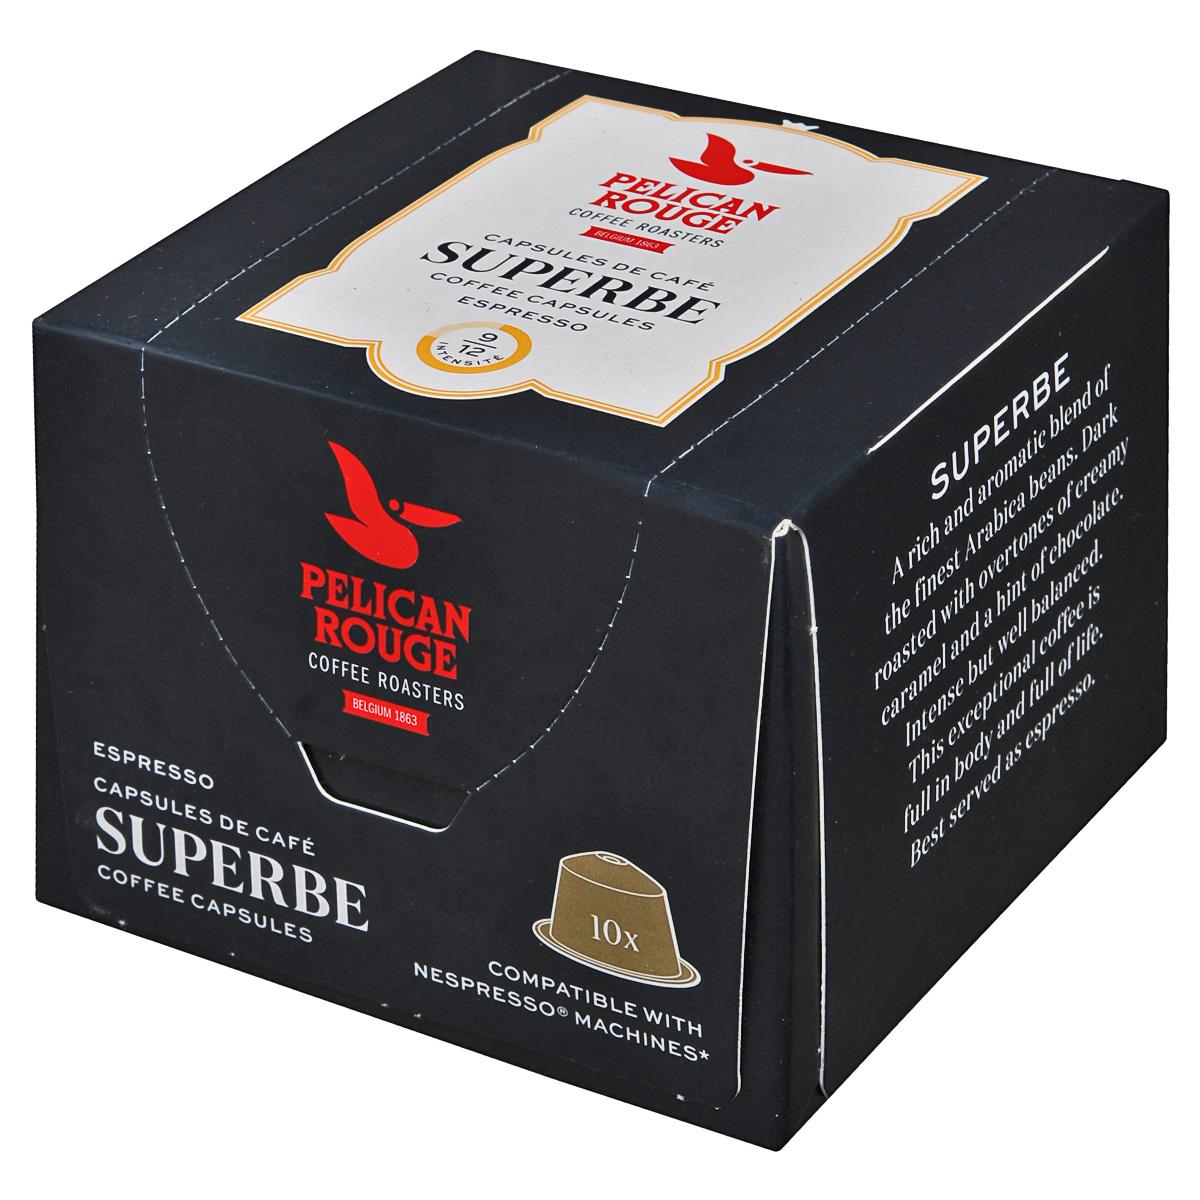 Pelican Rouge Superbe кофе в капсулах, 10 шт